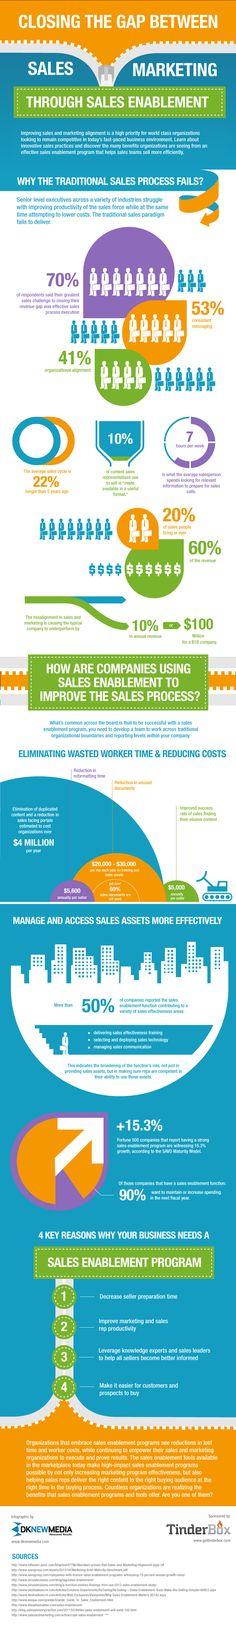 Closing the Gap between #Sales & #Marketing through Sales Enablement